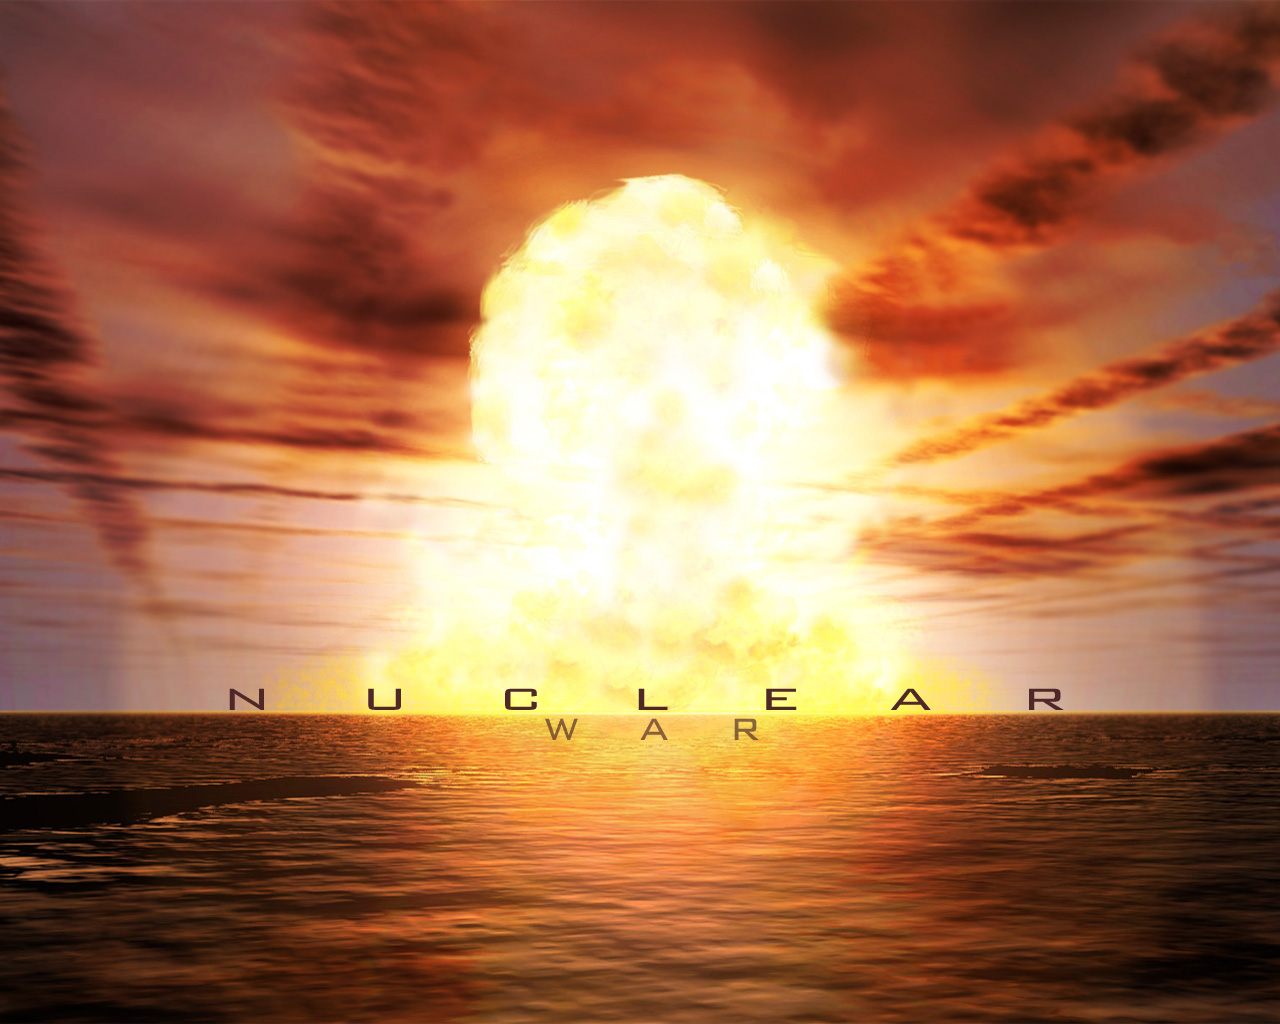 http://2.bp.blogspot.com/-56p-Dx-u620/TthU3jB9fQI/AAAAAAAAB1Y/4qwhIDOV17k/s1600/Nuclear+Explosions+Since+1945+Full+HD+Wallpapers+%285%29.jpg